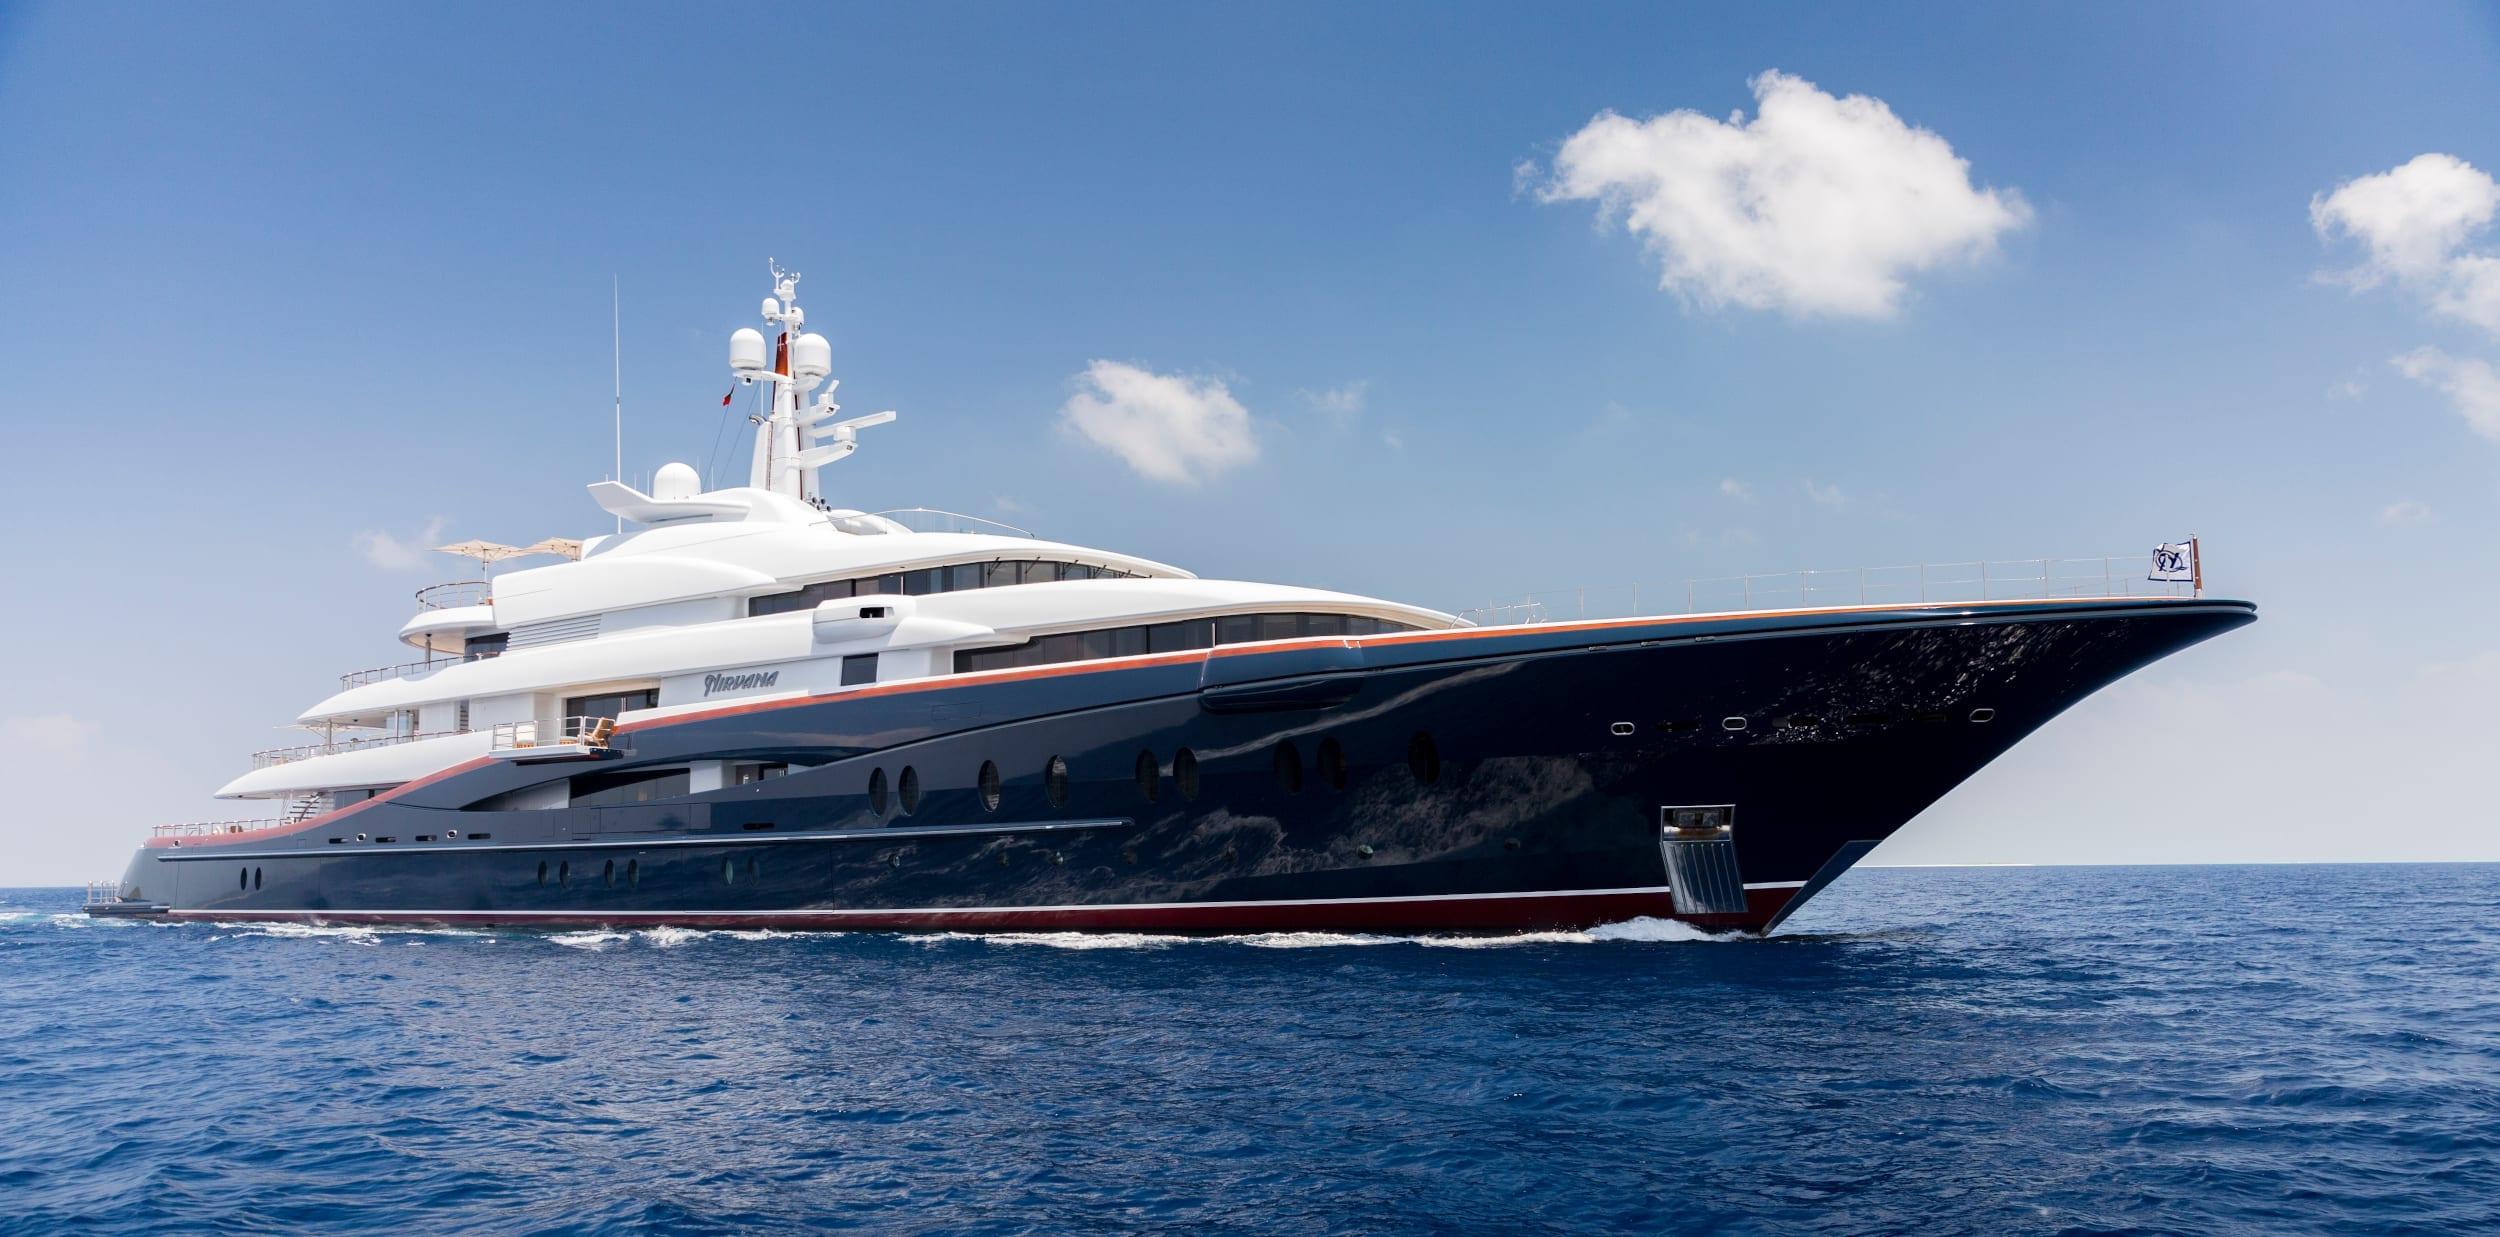 Profile of Nirvana yacht underway